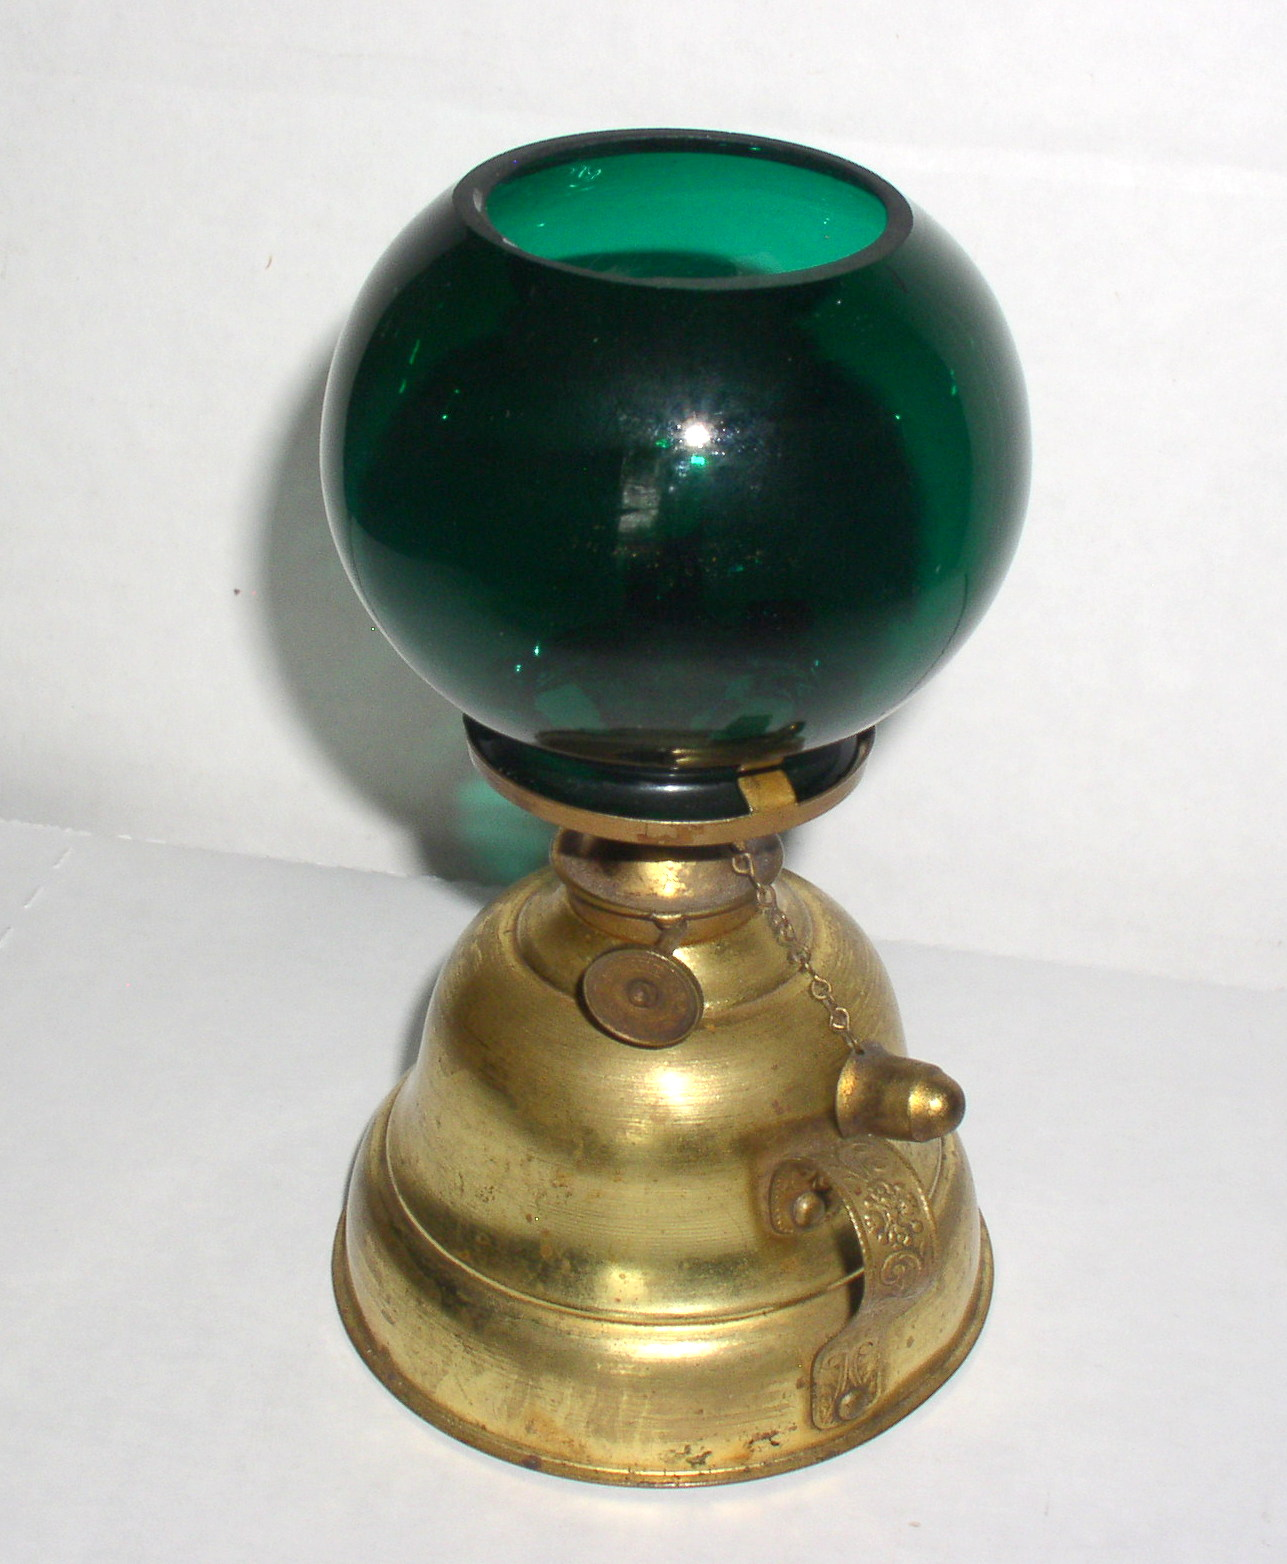 Metal Ball Lamp Shade: Antique Brass Finger Oil Lamp With Green Cigar Lighter